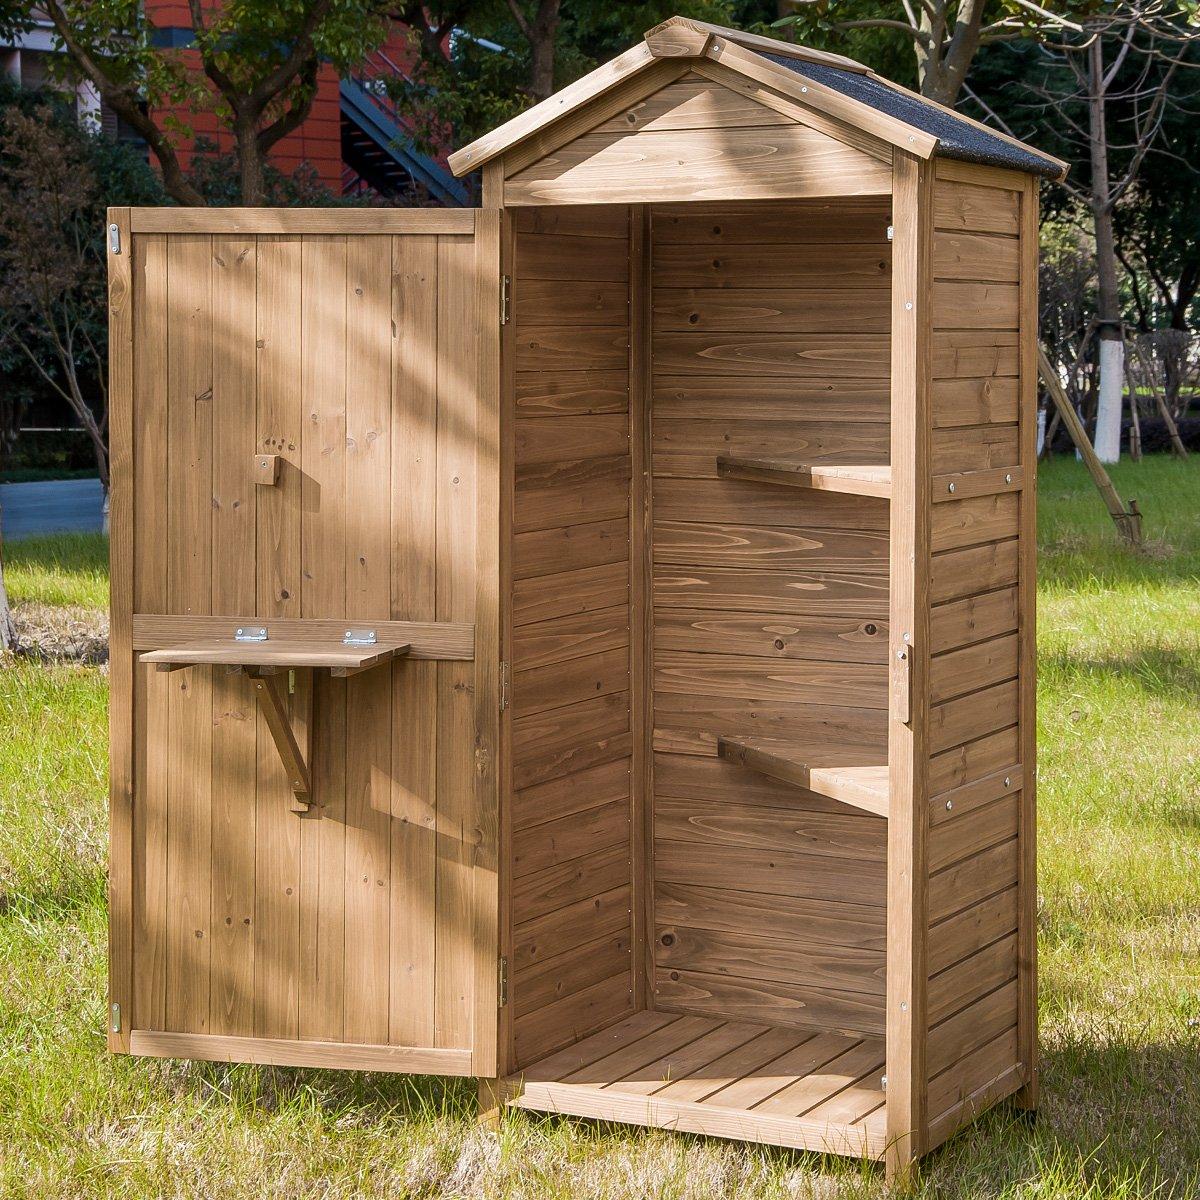 Amazon.com : Leisure Zone Outdoor Wooden Garden Shed Lockers Fir ...